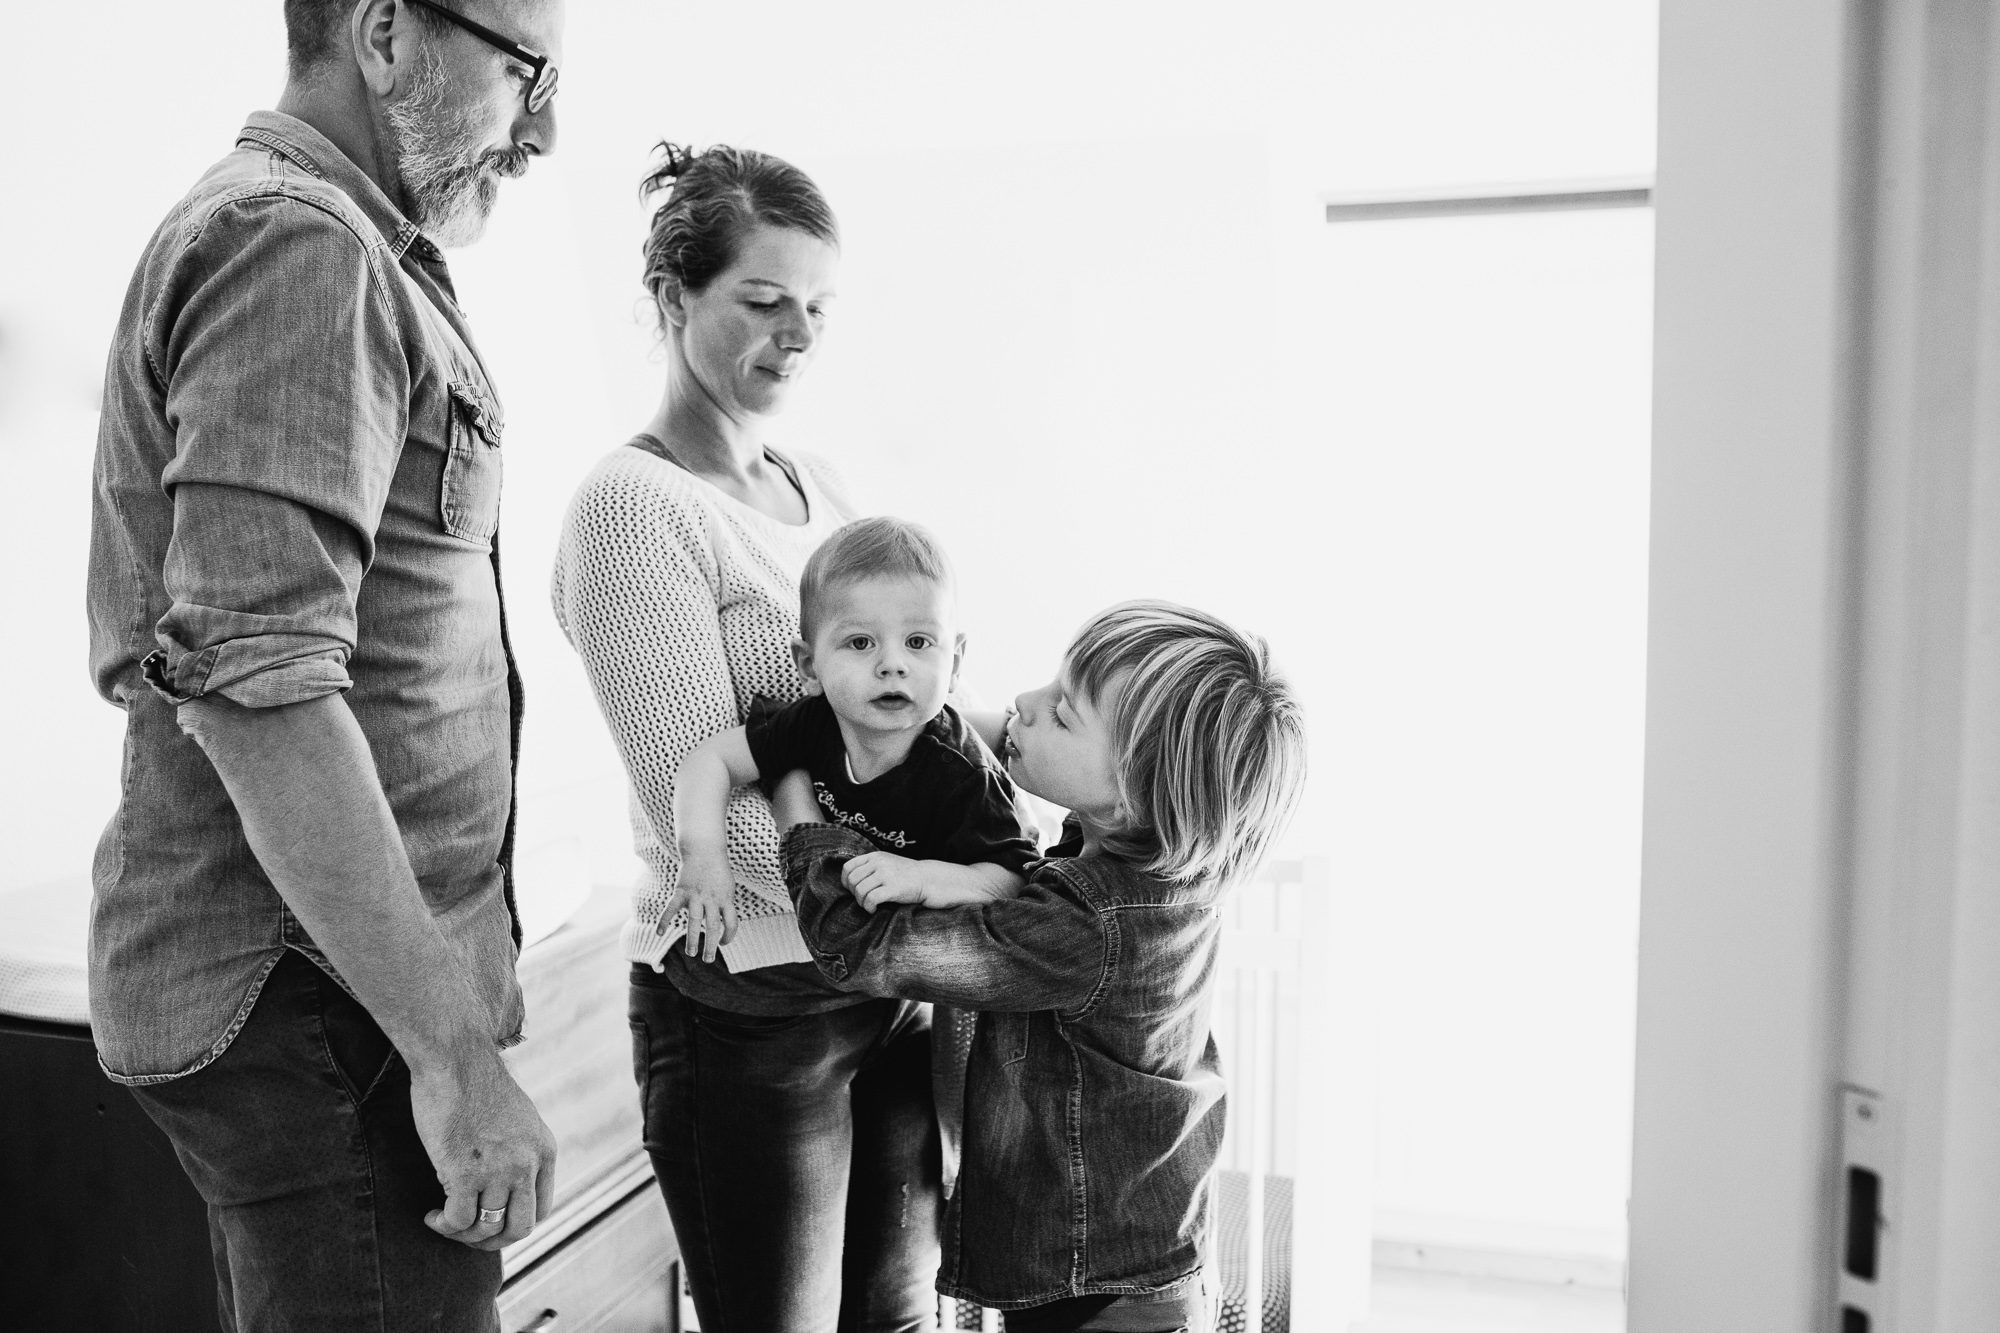 gezinsfotogshoot thuis Boxtel